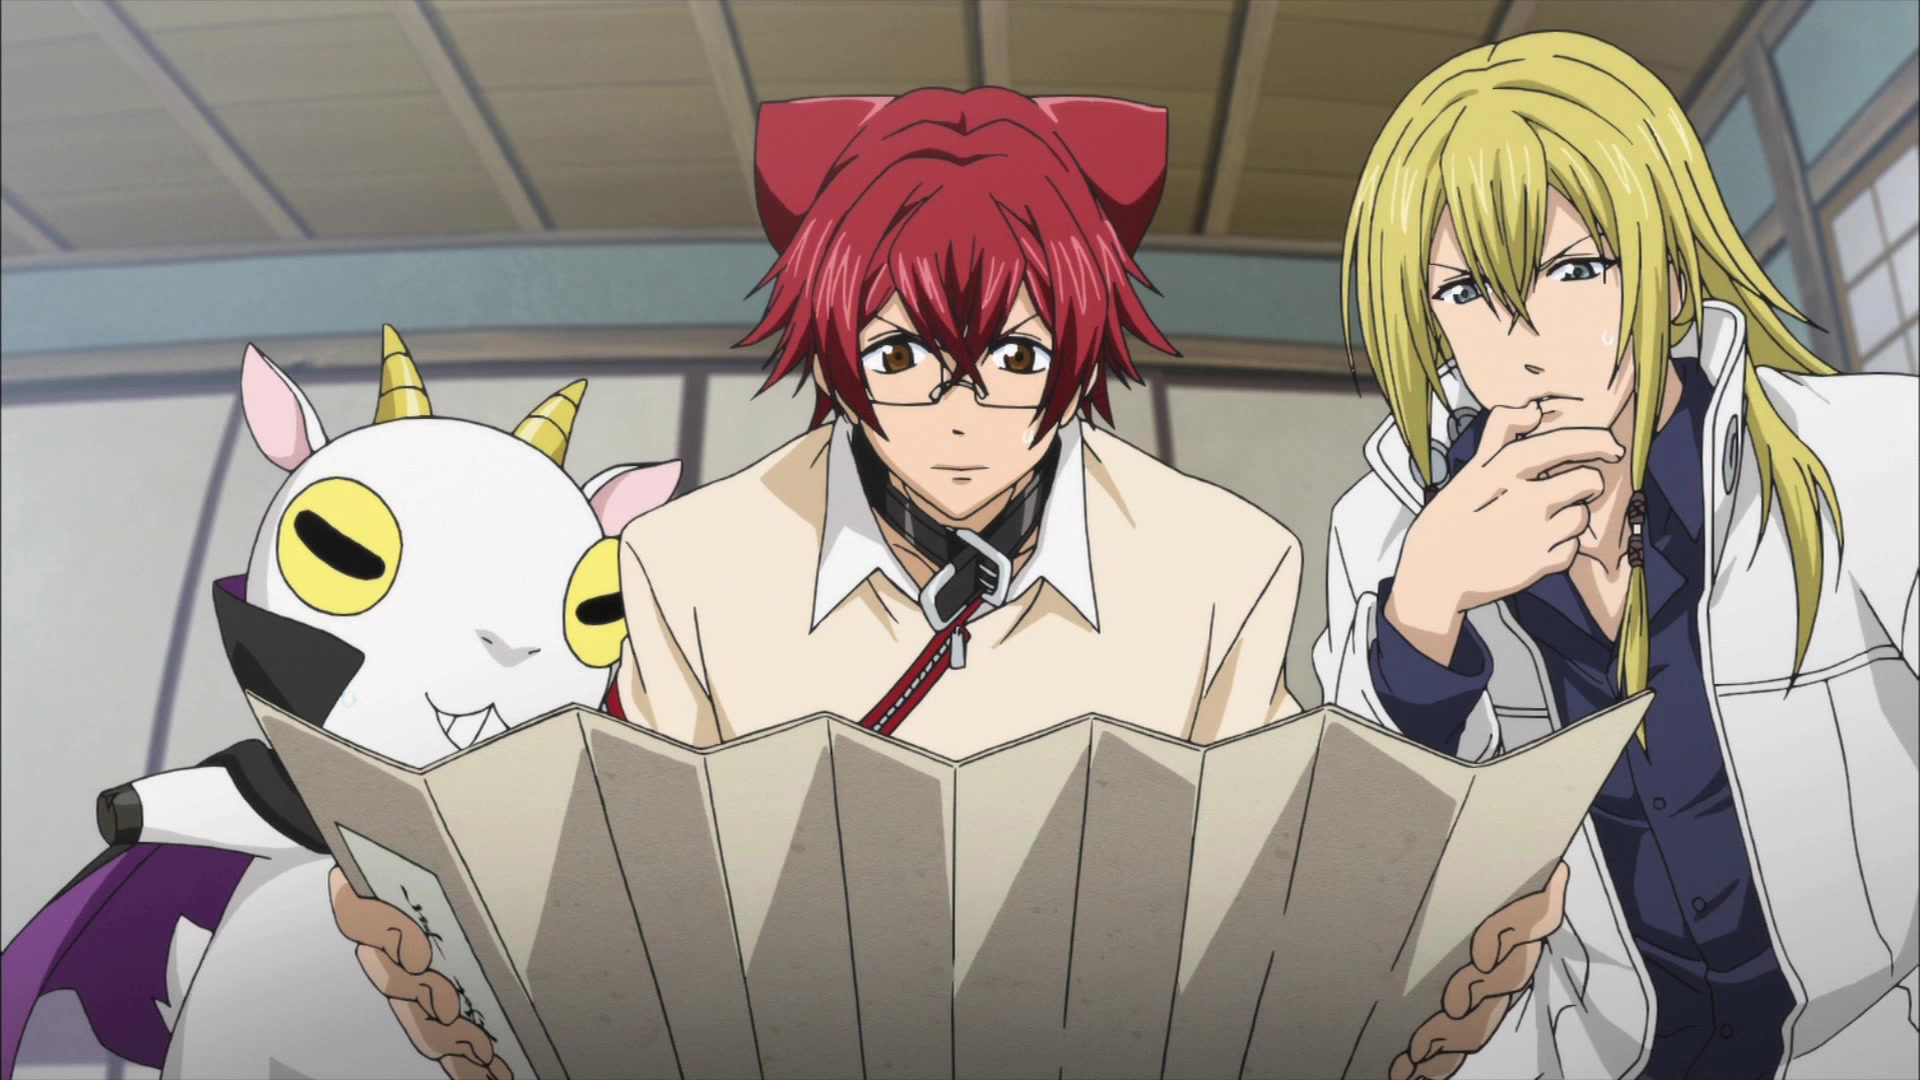 cuticle detective inaba episode 10 sub indo